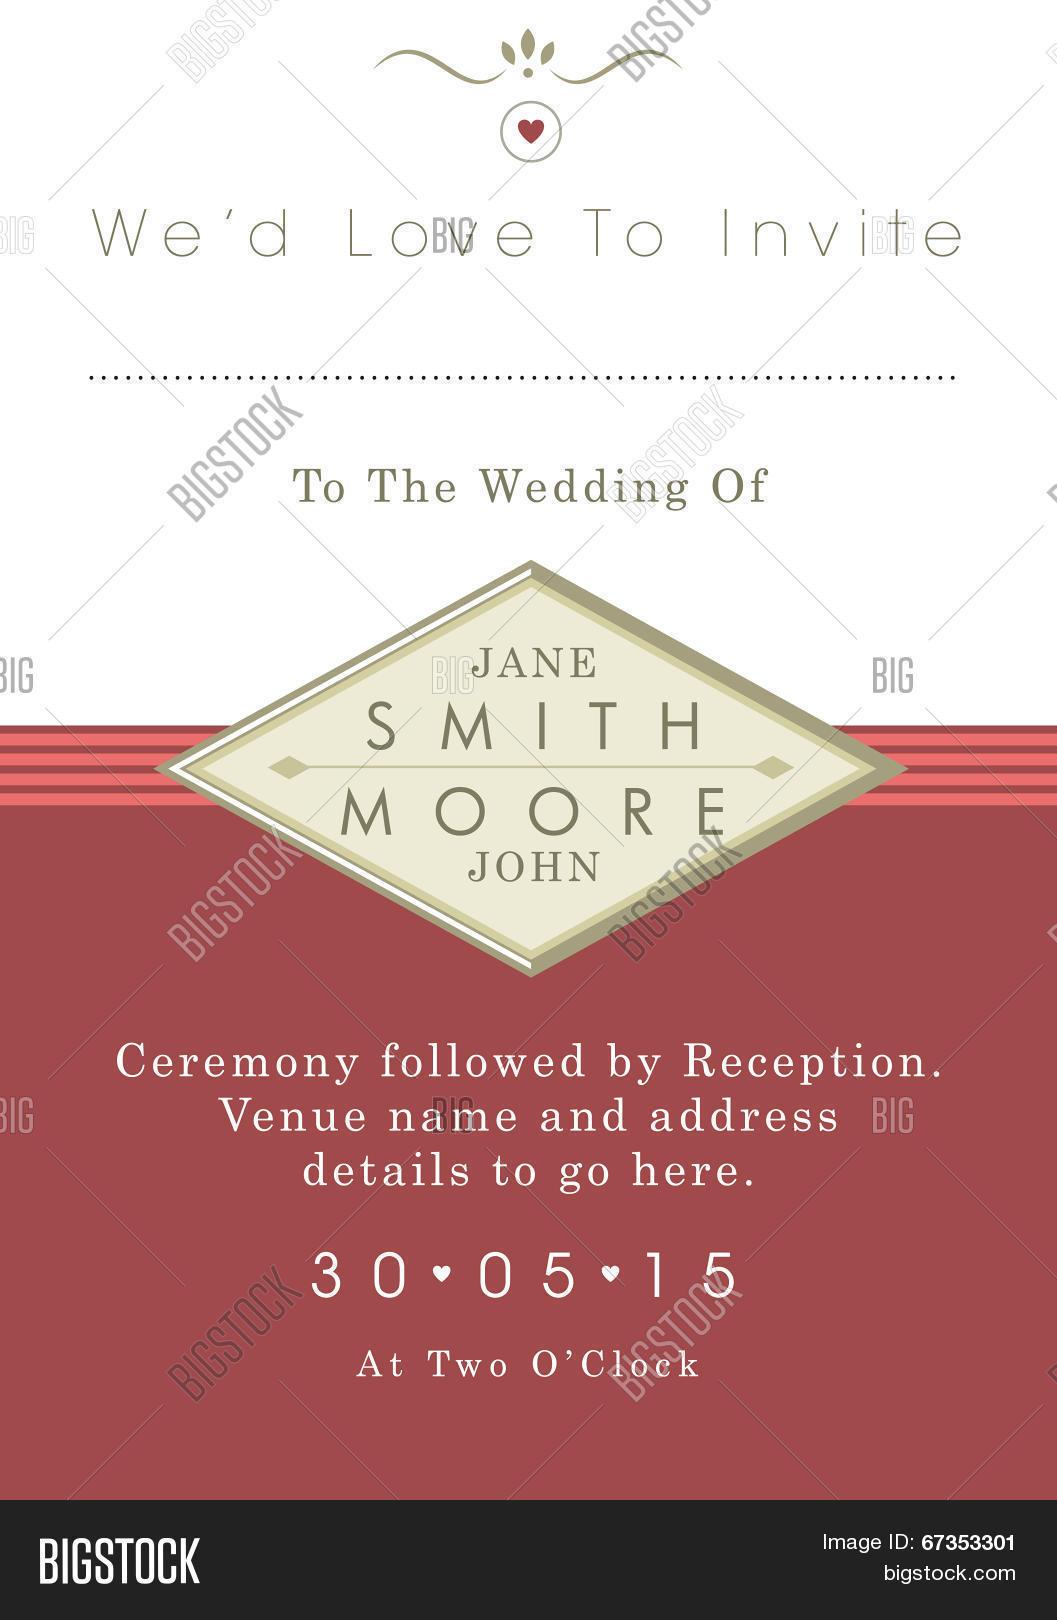 Wedding Invitation Vector & Photo (Free Trial) | Bigstock